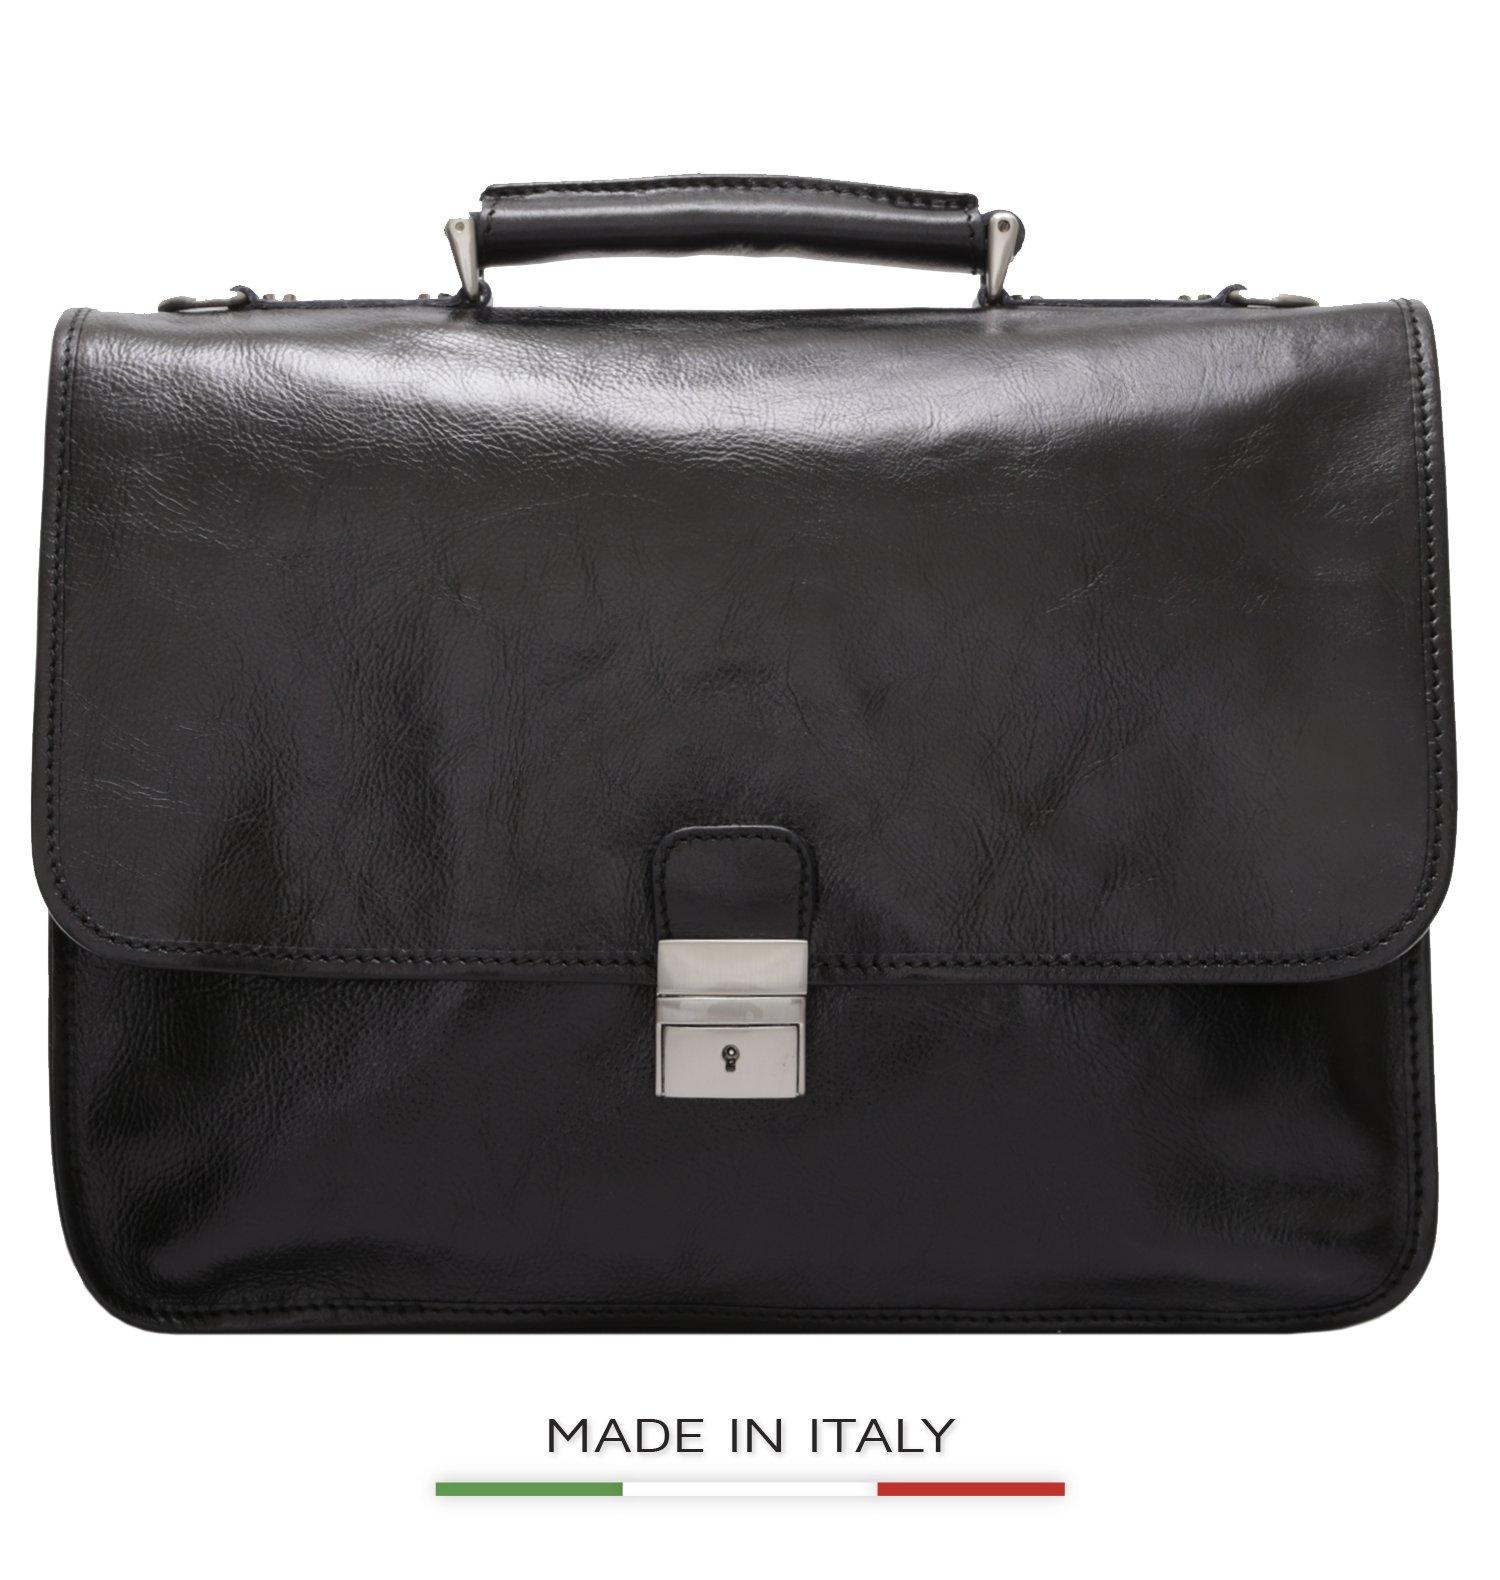 Luggage Depot USA, LLC Men's Alberto Bellucci Italian Leather Double Gusset Laptop Messenger Bag, Black, One Size